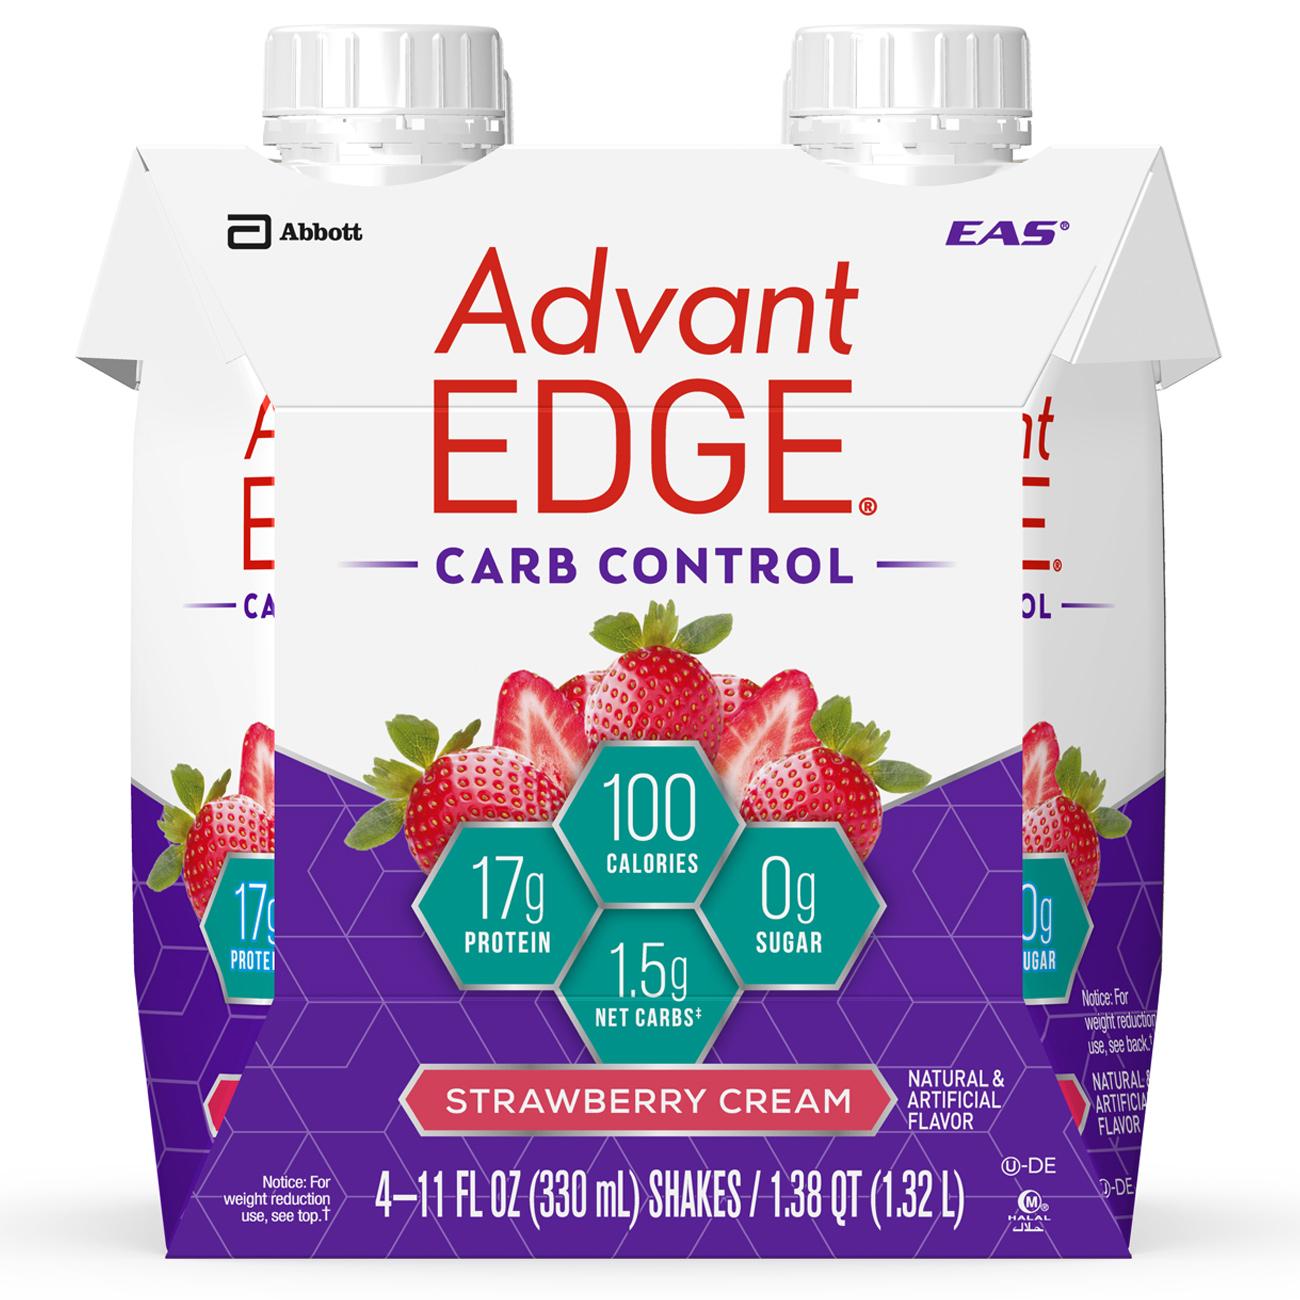 EAS AdvantEDGE Carb Control Protein Shake, Strawberry Cream, 17g Protein, 4 Ct